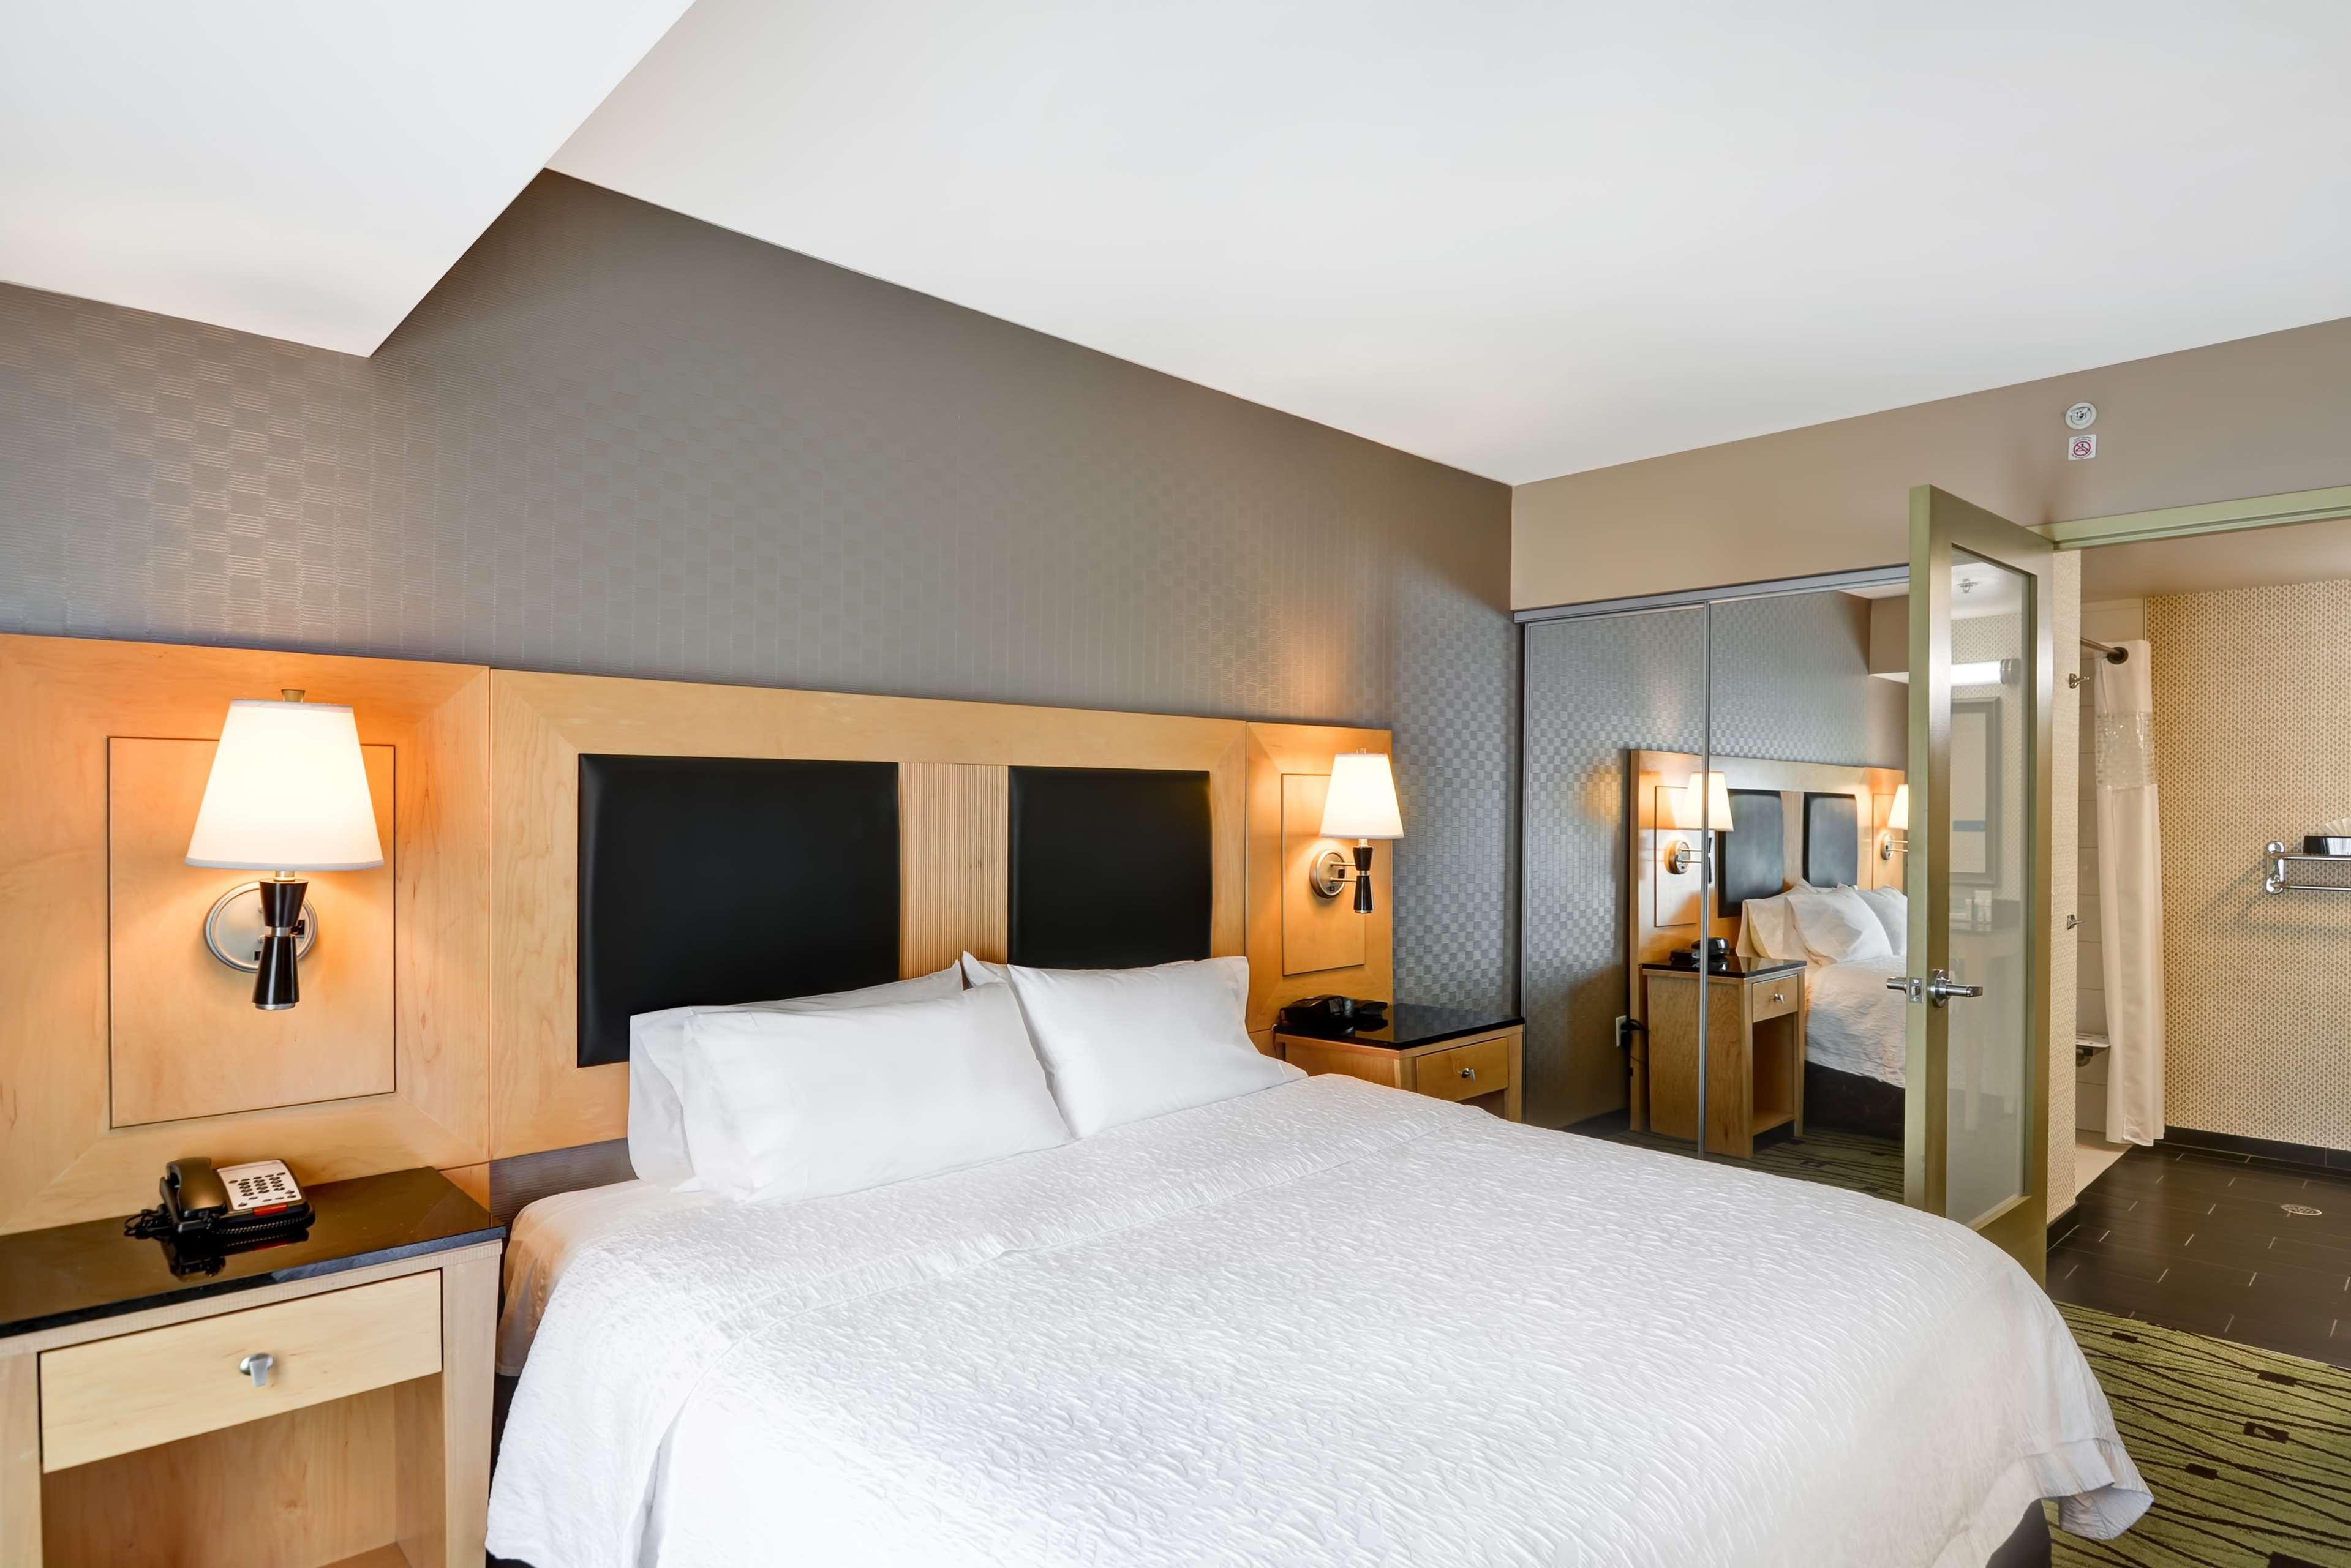 Hampton Inn & Suites Raleigh/Crabtree Valley image 22